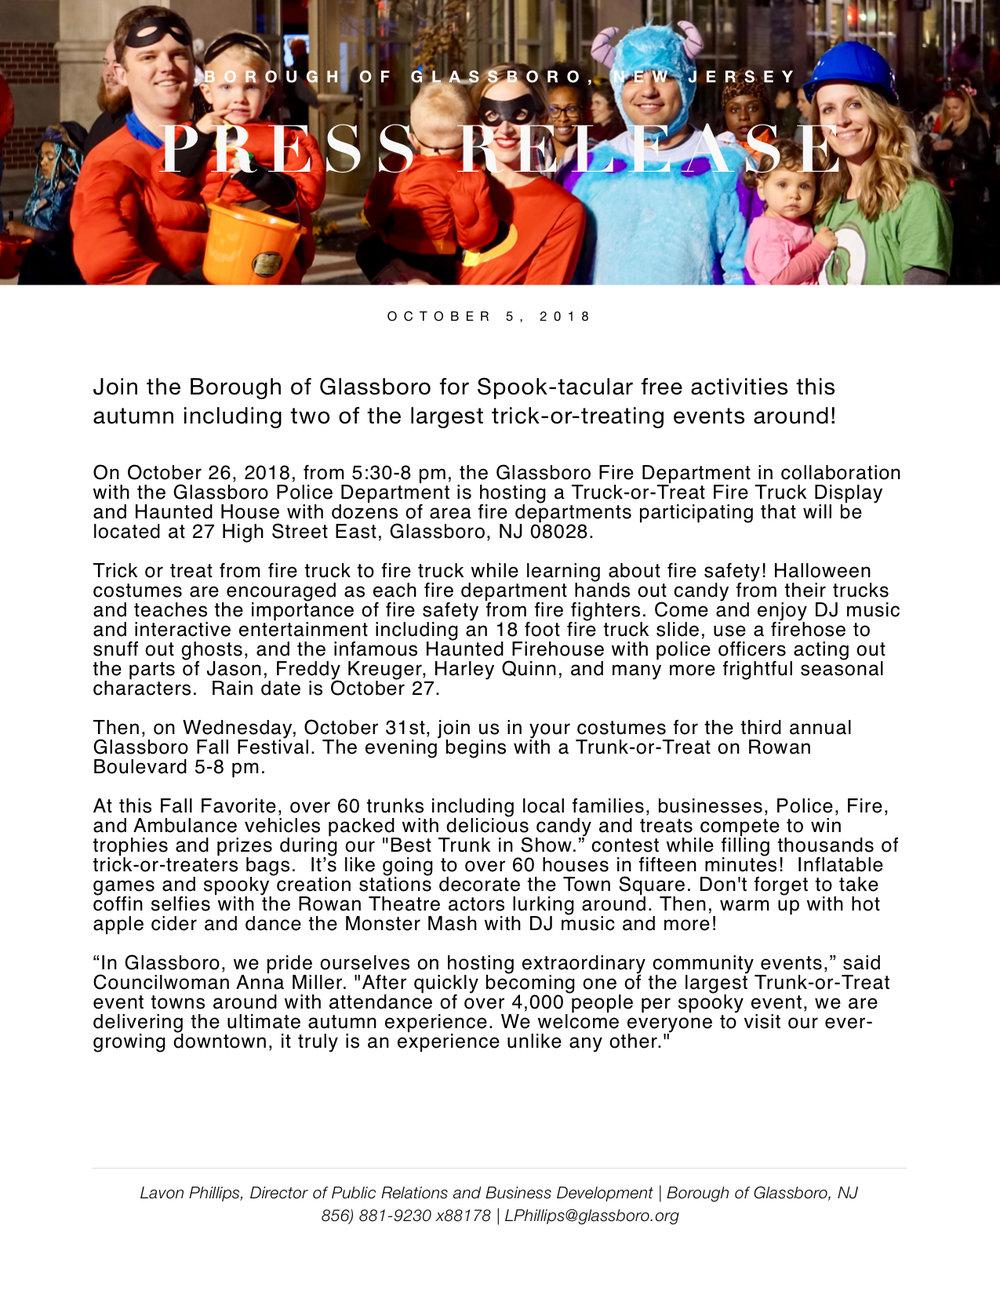 Glassboro NJ Press Release 2018 Fall Festival and Trunk or Treat.jpeg